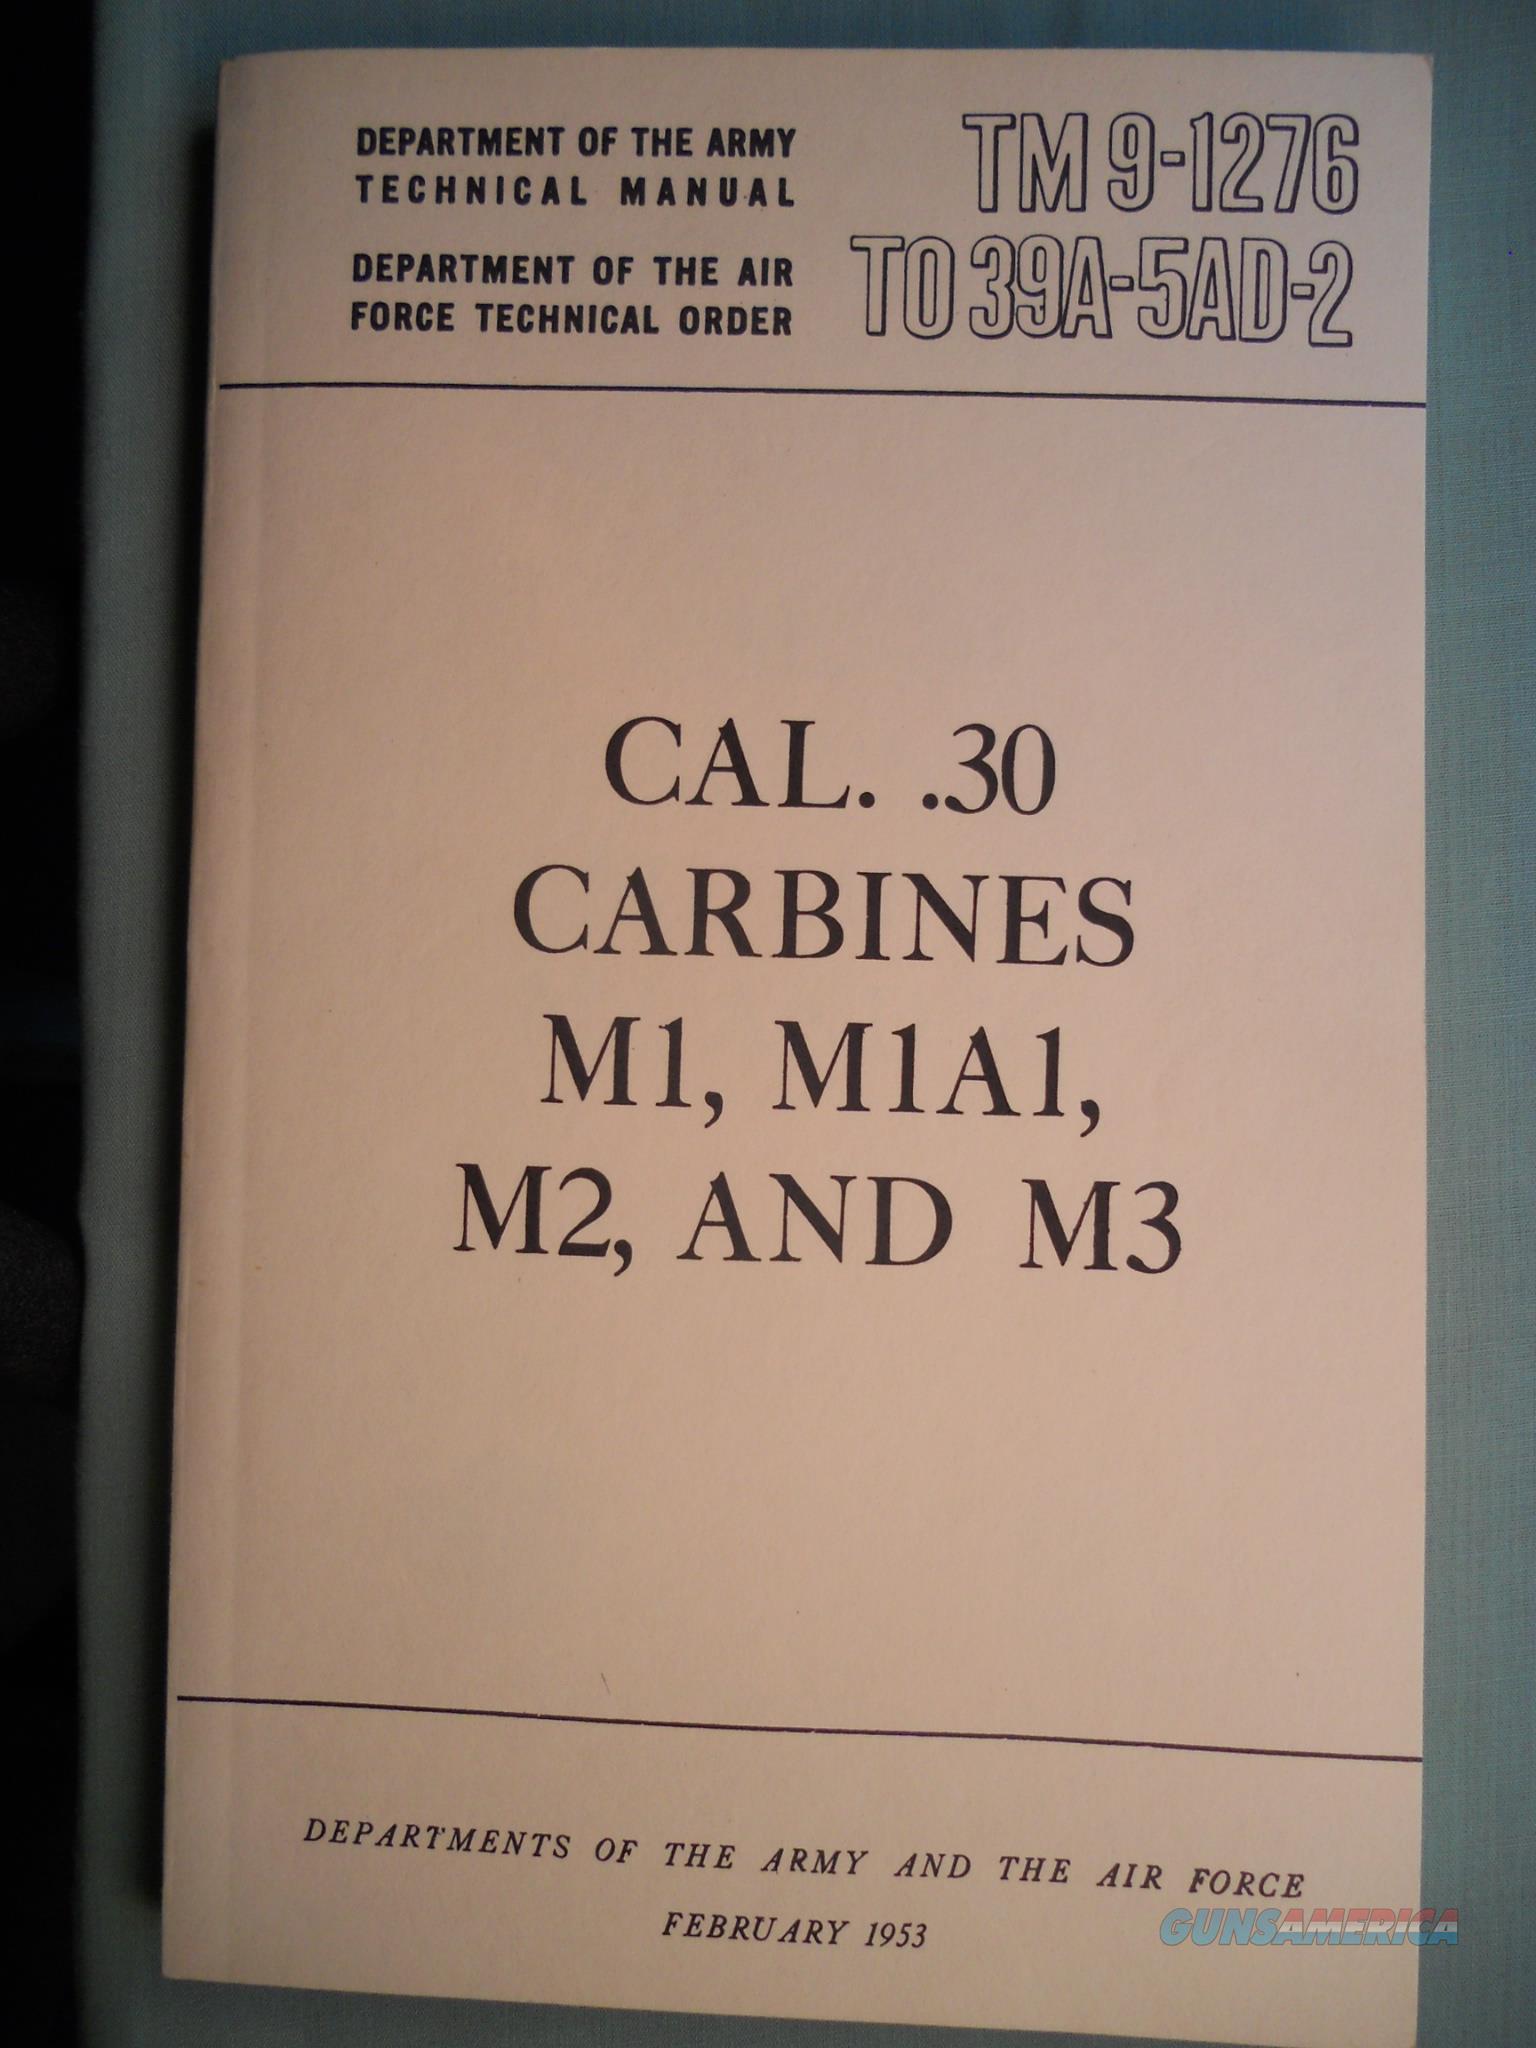 CAL. .30 CARBINES, M1, M1A1, M2, AND M3 TM 9-1276 T039A-5AD-2 FEBRUARY 1953  Non-Guns > Magazines & Clips > Rifle Magazines > Other